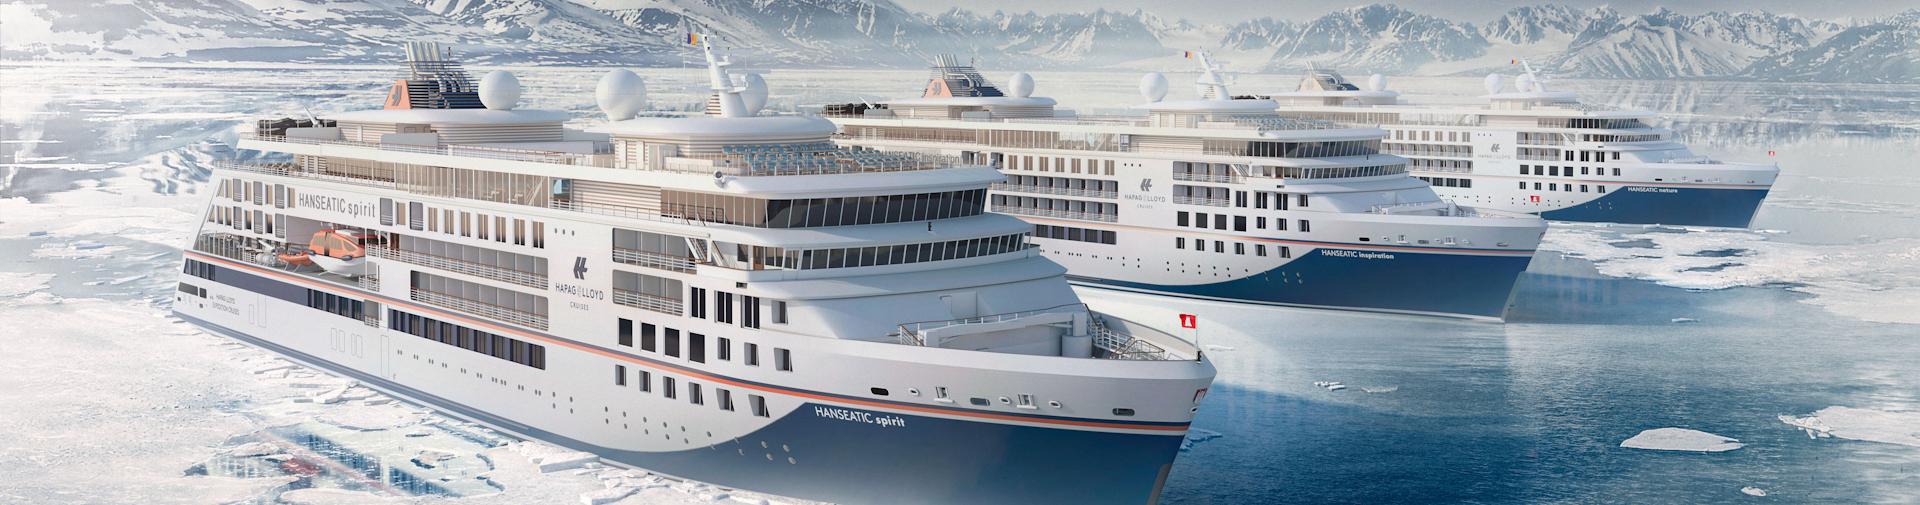 Hapag LIoyd neue Schiffe